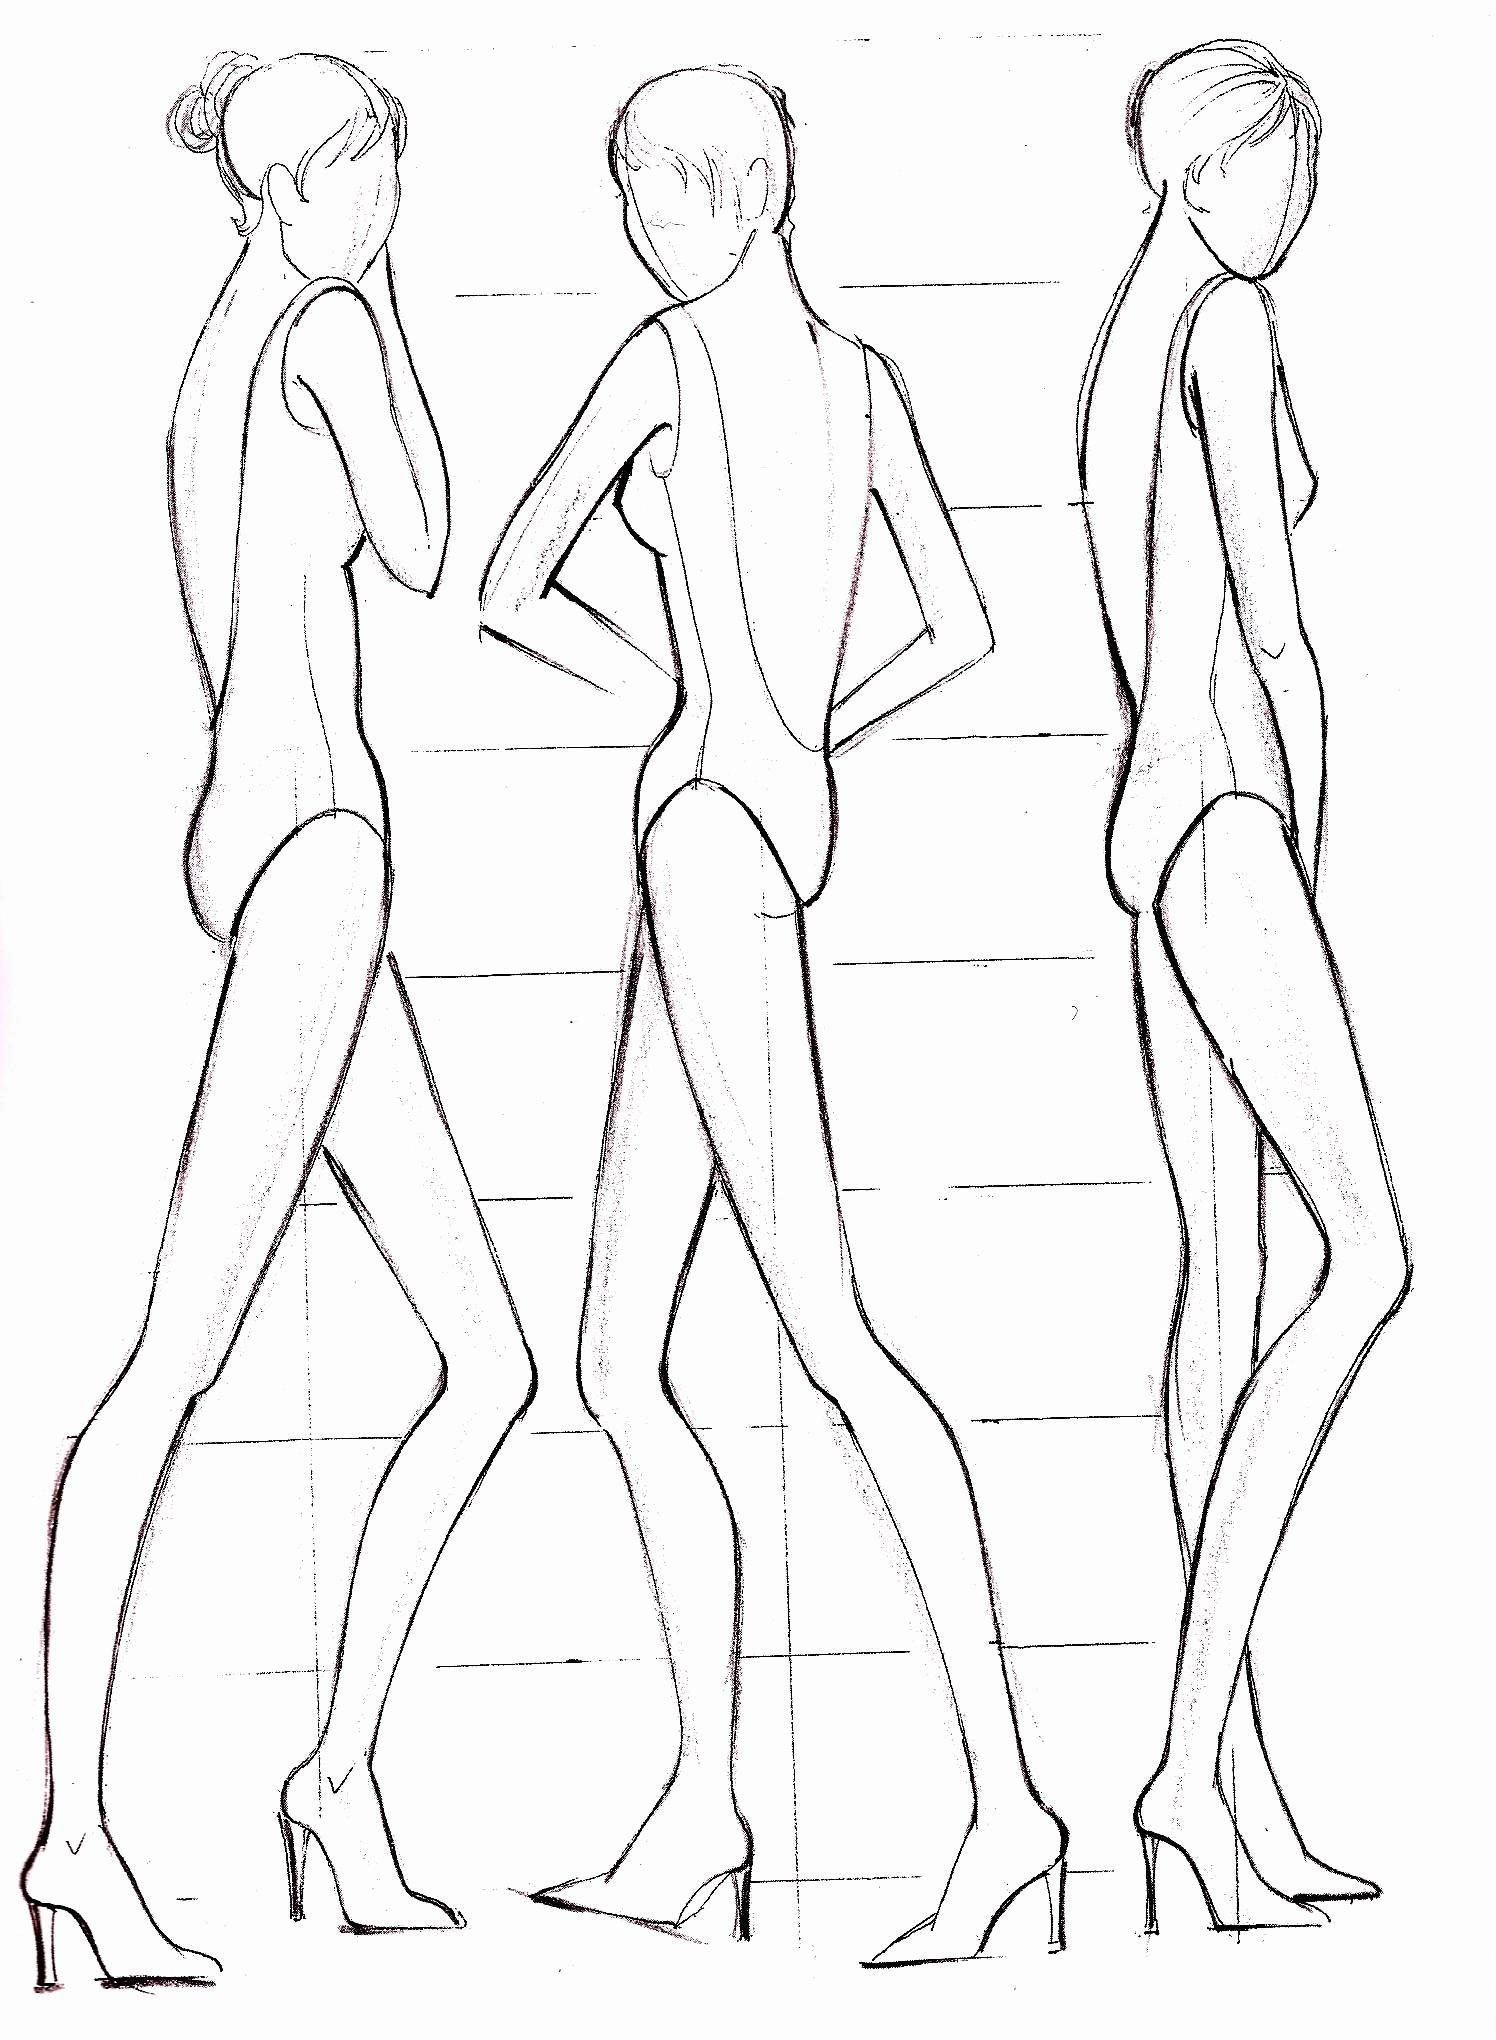 Blank Female Body Template Inspirational Pin Fashion Figure Templates On Pinterest